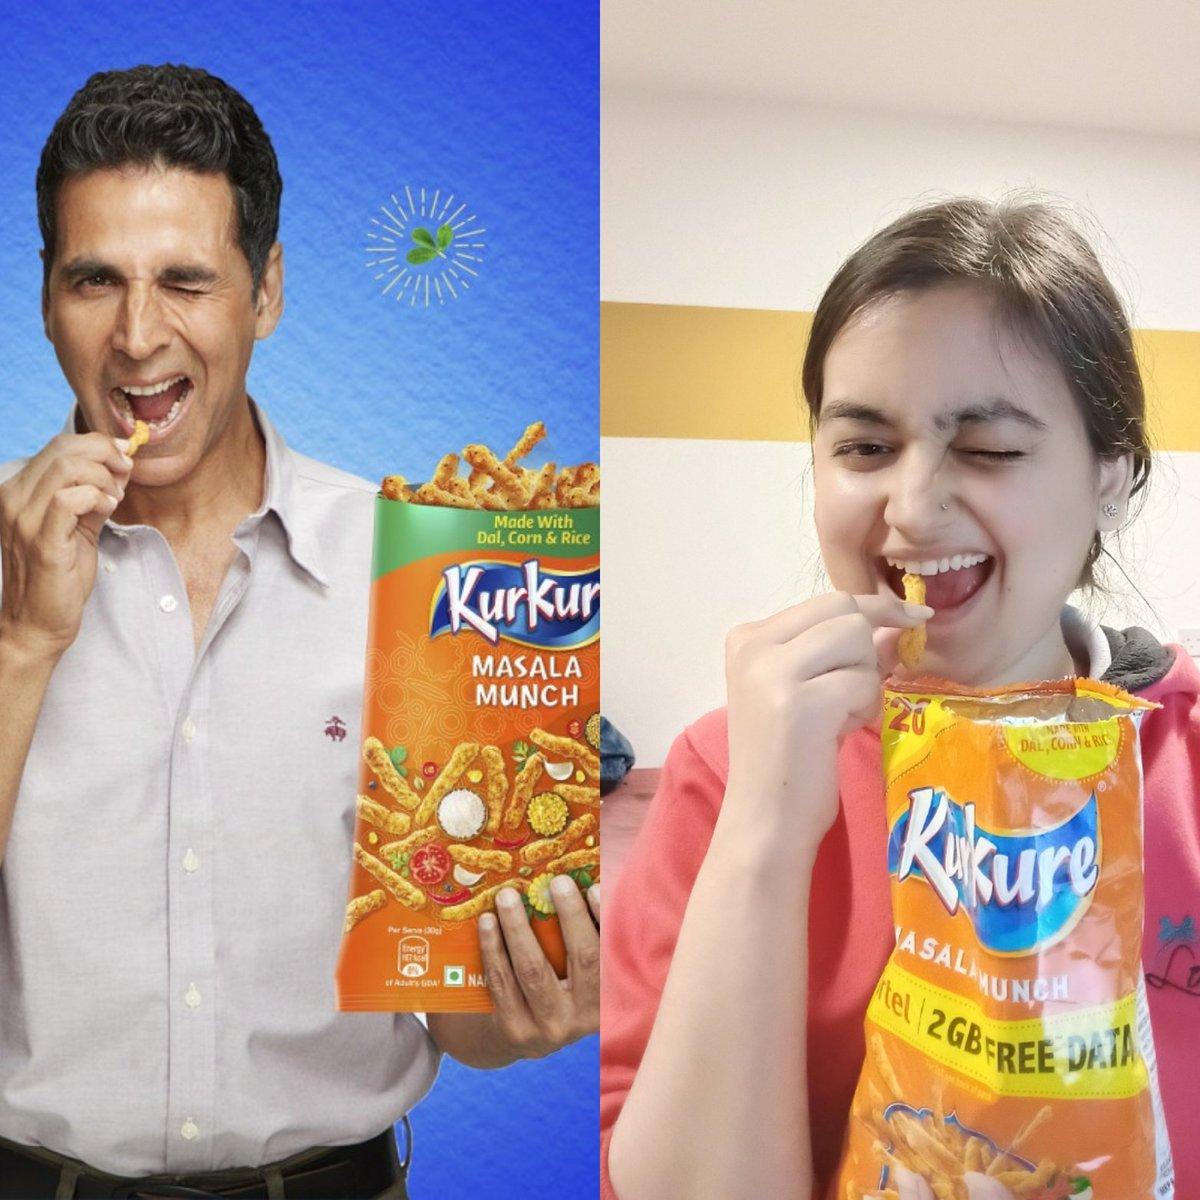 We love kurkure 😜 same pose ho gayaaa almost @akshaykumar #kurkure ❤️❤️❤️